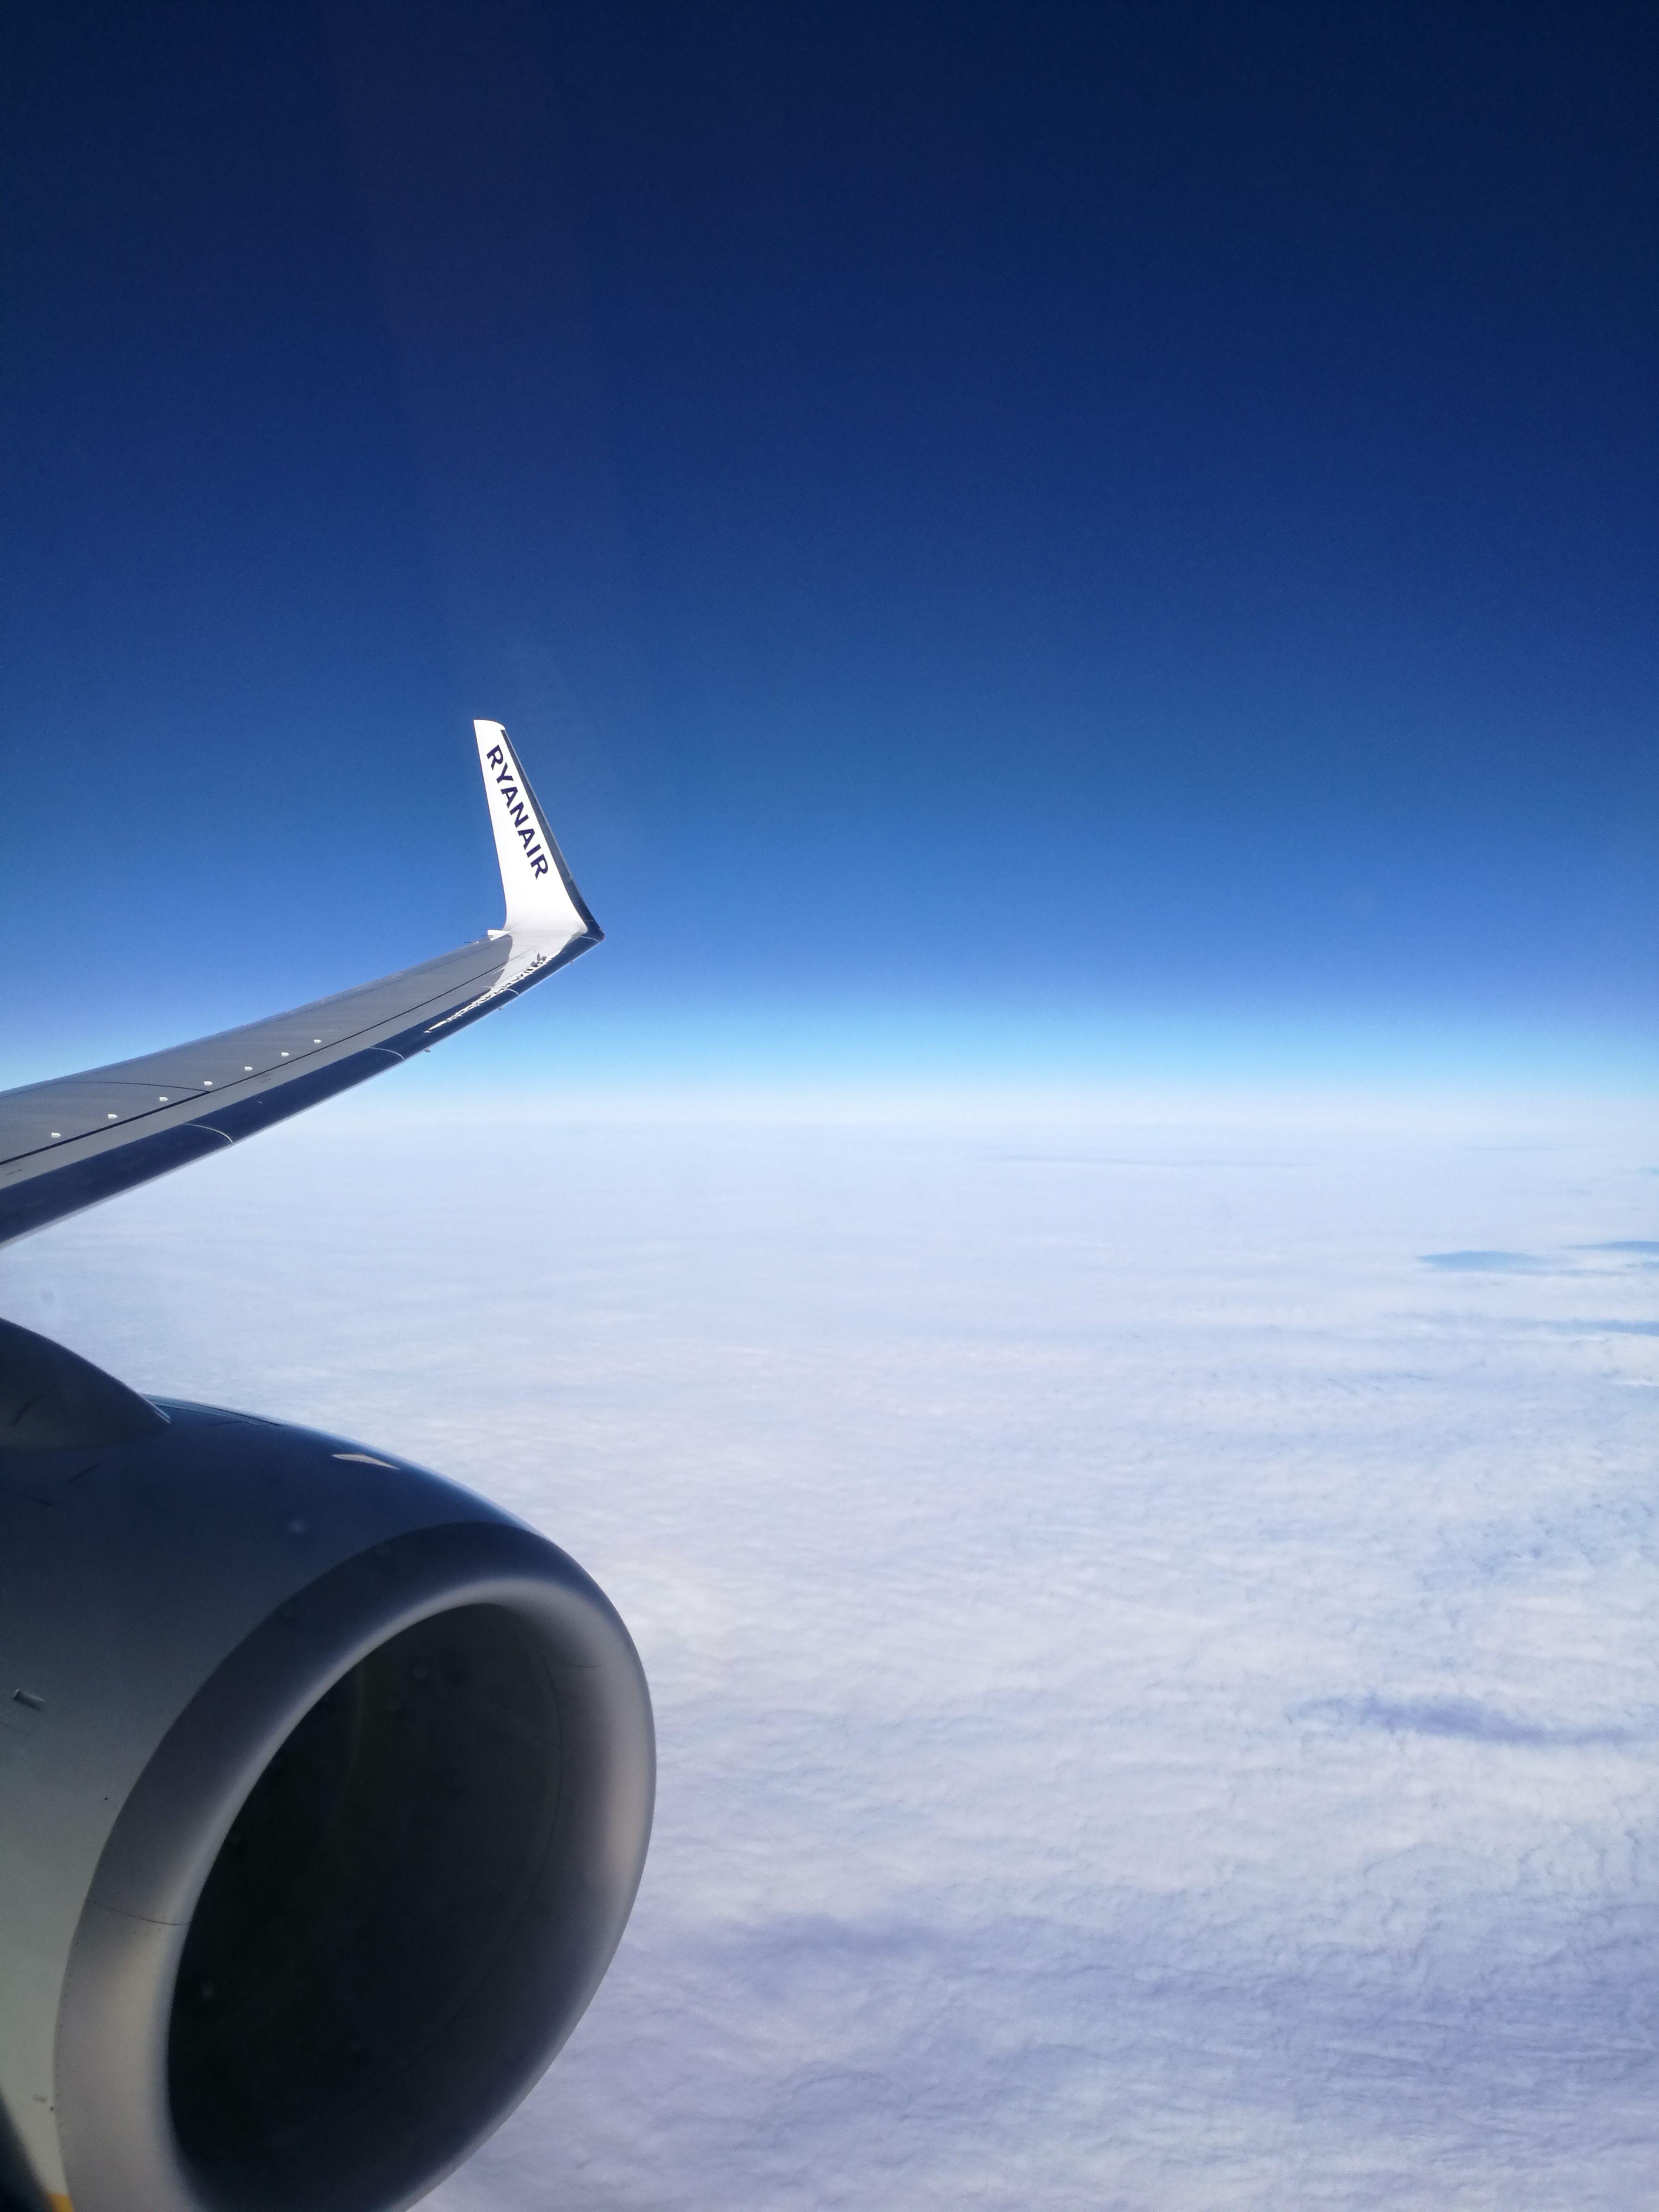 Turbolence Nowhere Flight FR6309 Finding New Frontiers